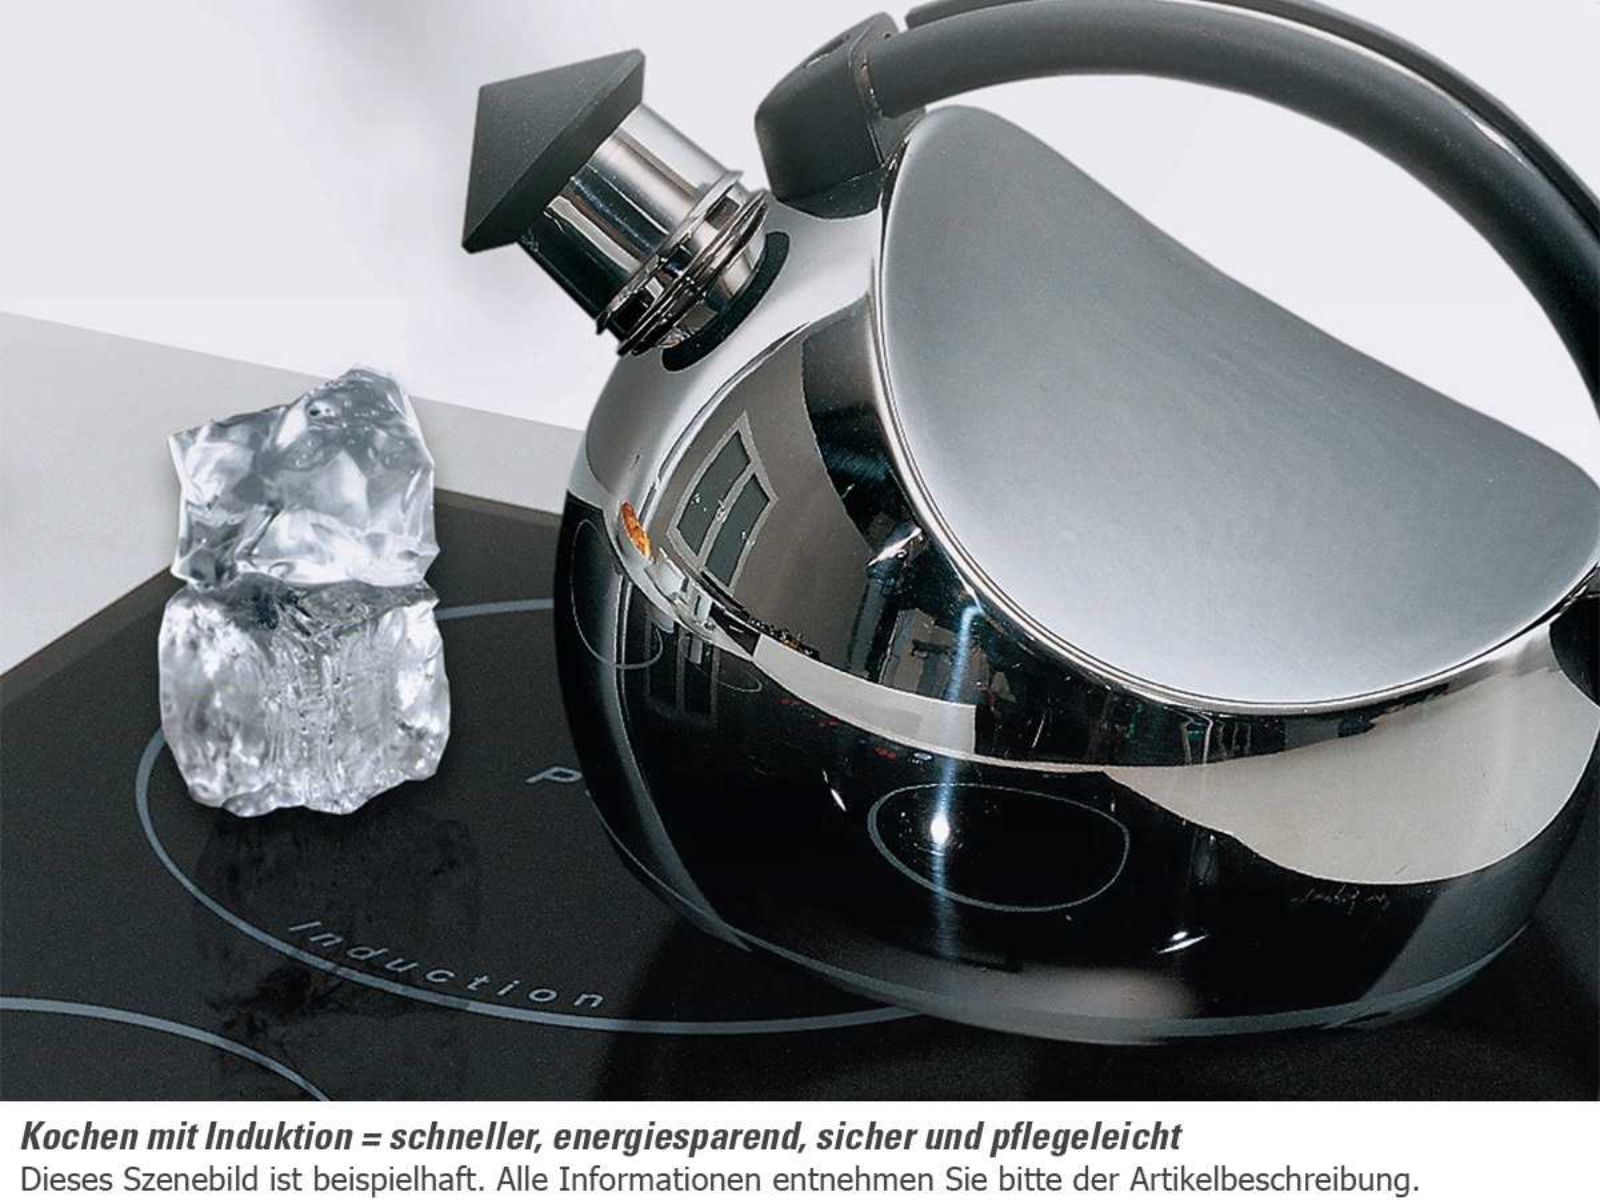 teka irf 641 induktion glaskeramik kochfeld autark ebay. Black Bedroom Furniture Sets. Home Design Ideas